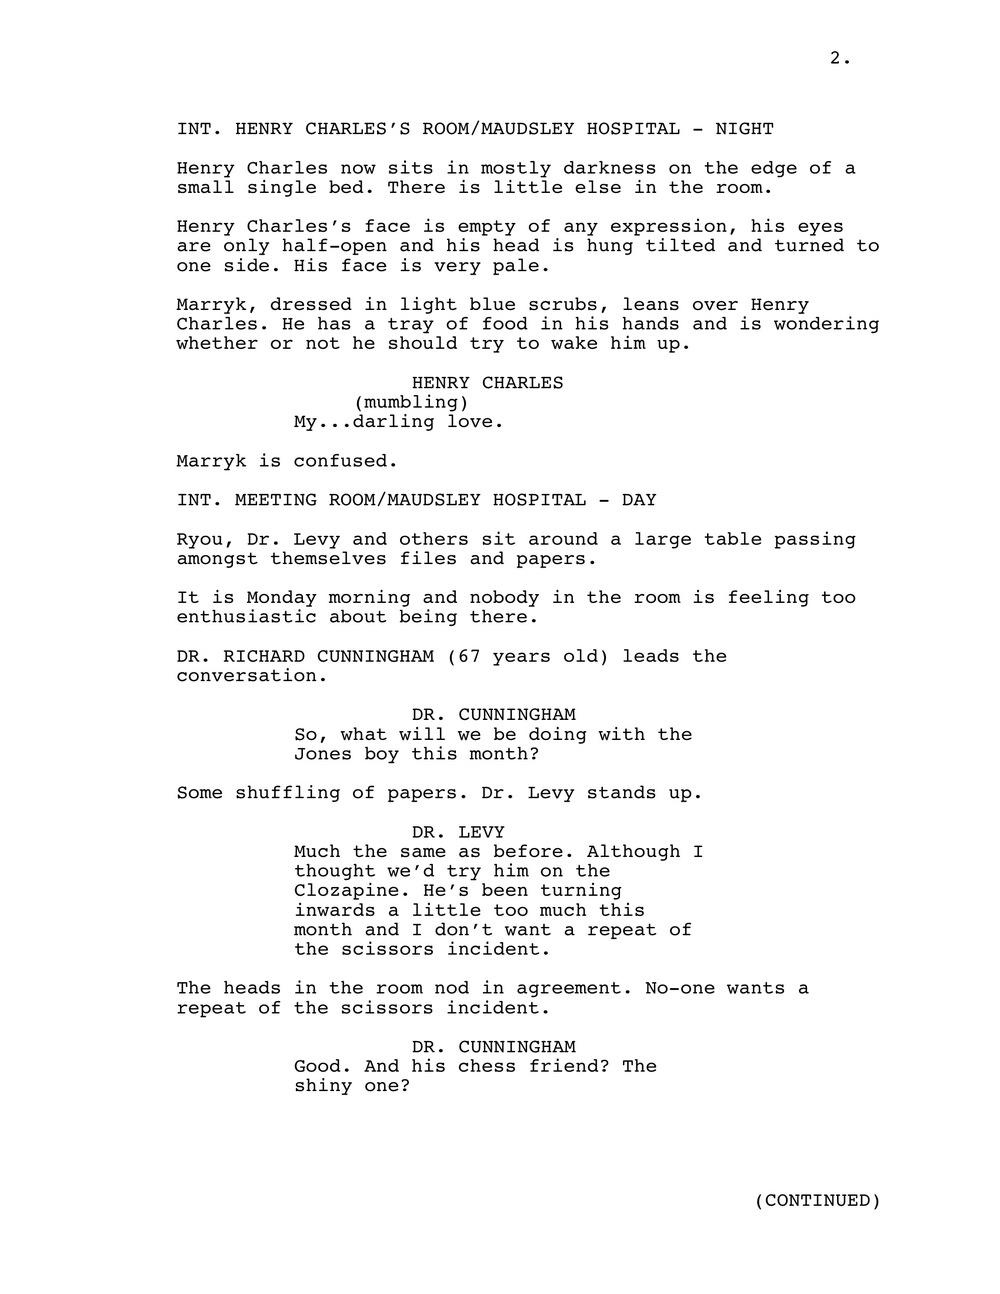 'Introducing Henry Charles' (Pilot) by Alexander Craig | 2.jpeg